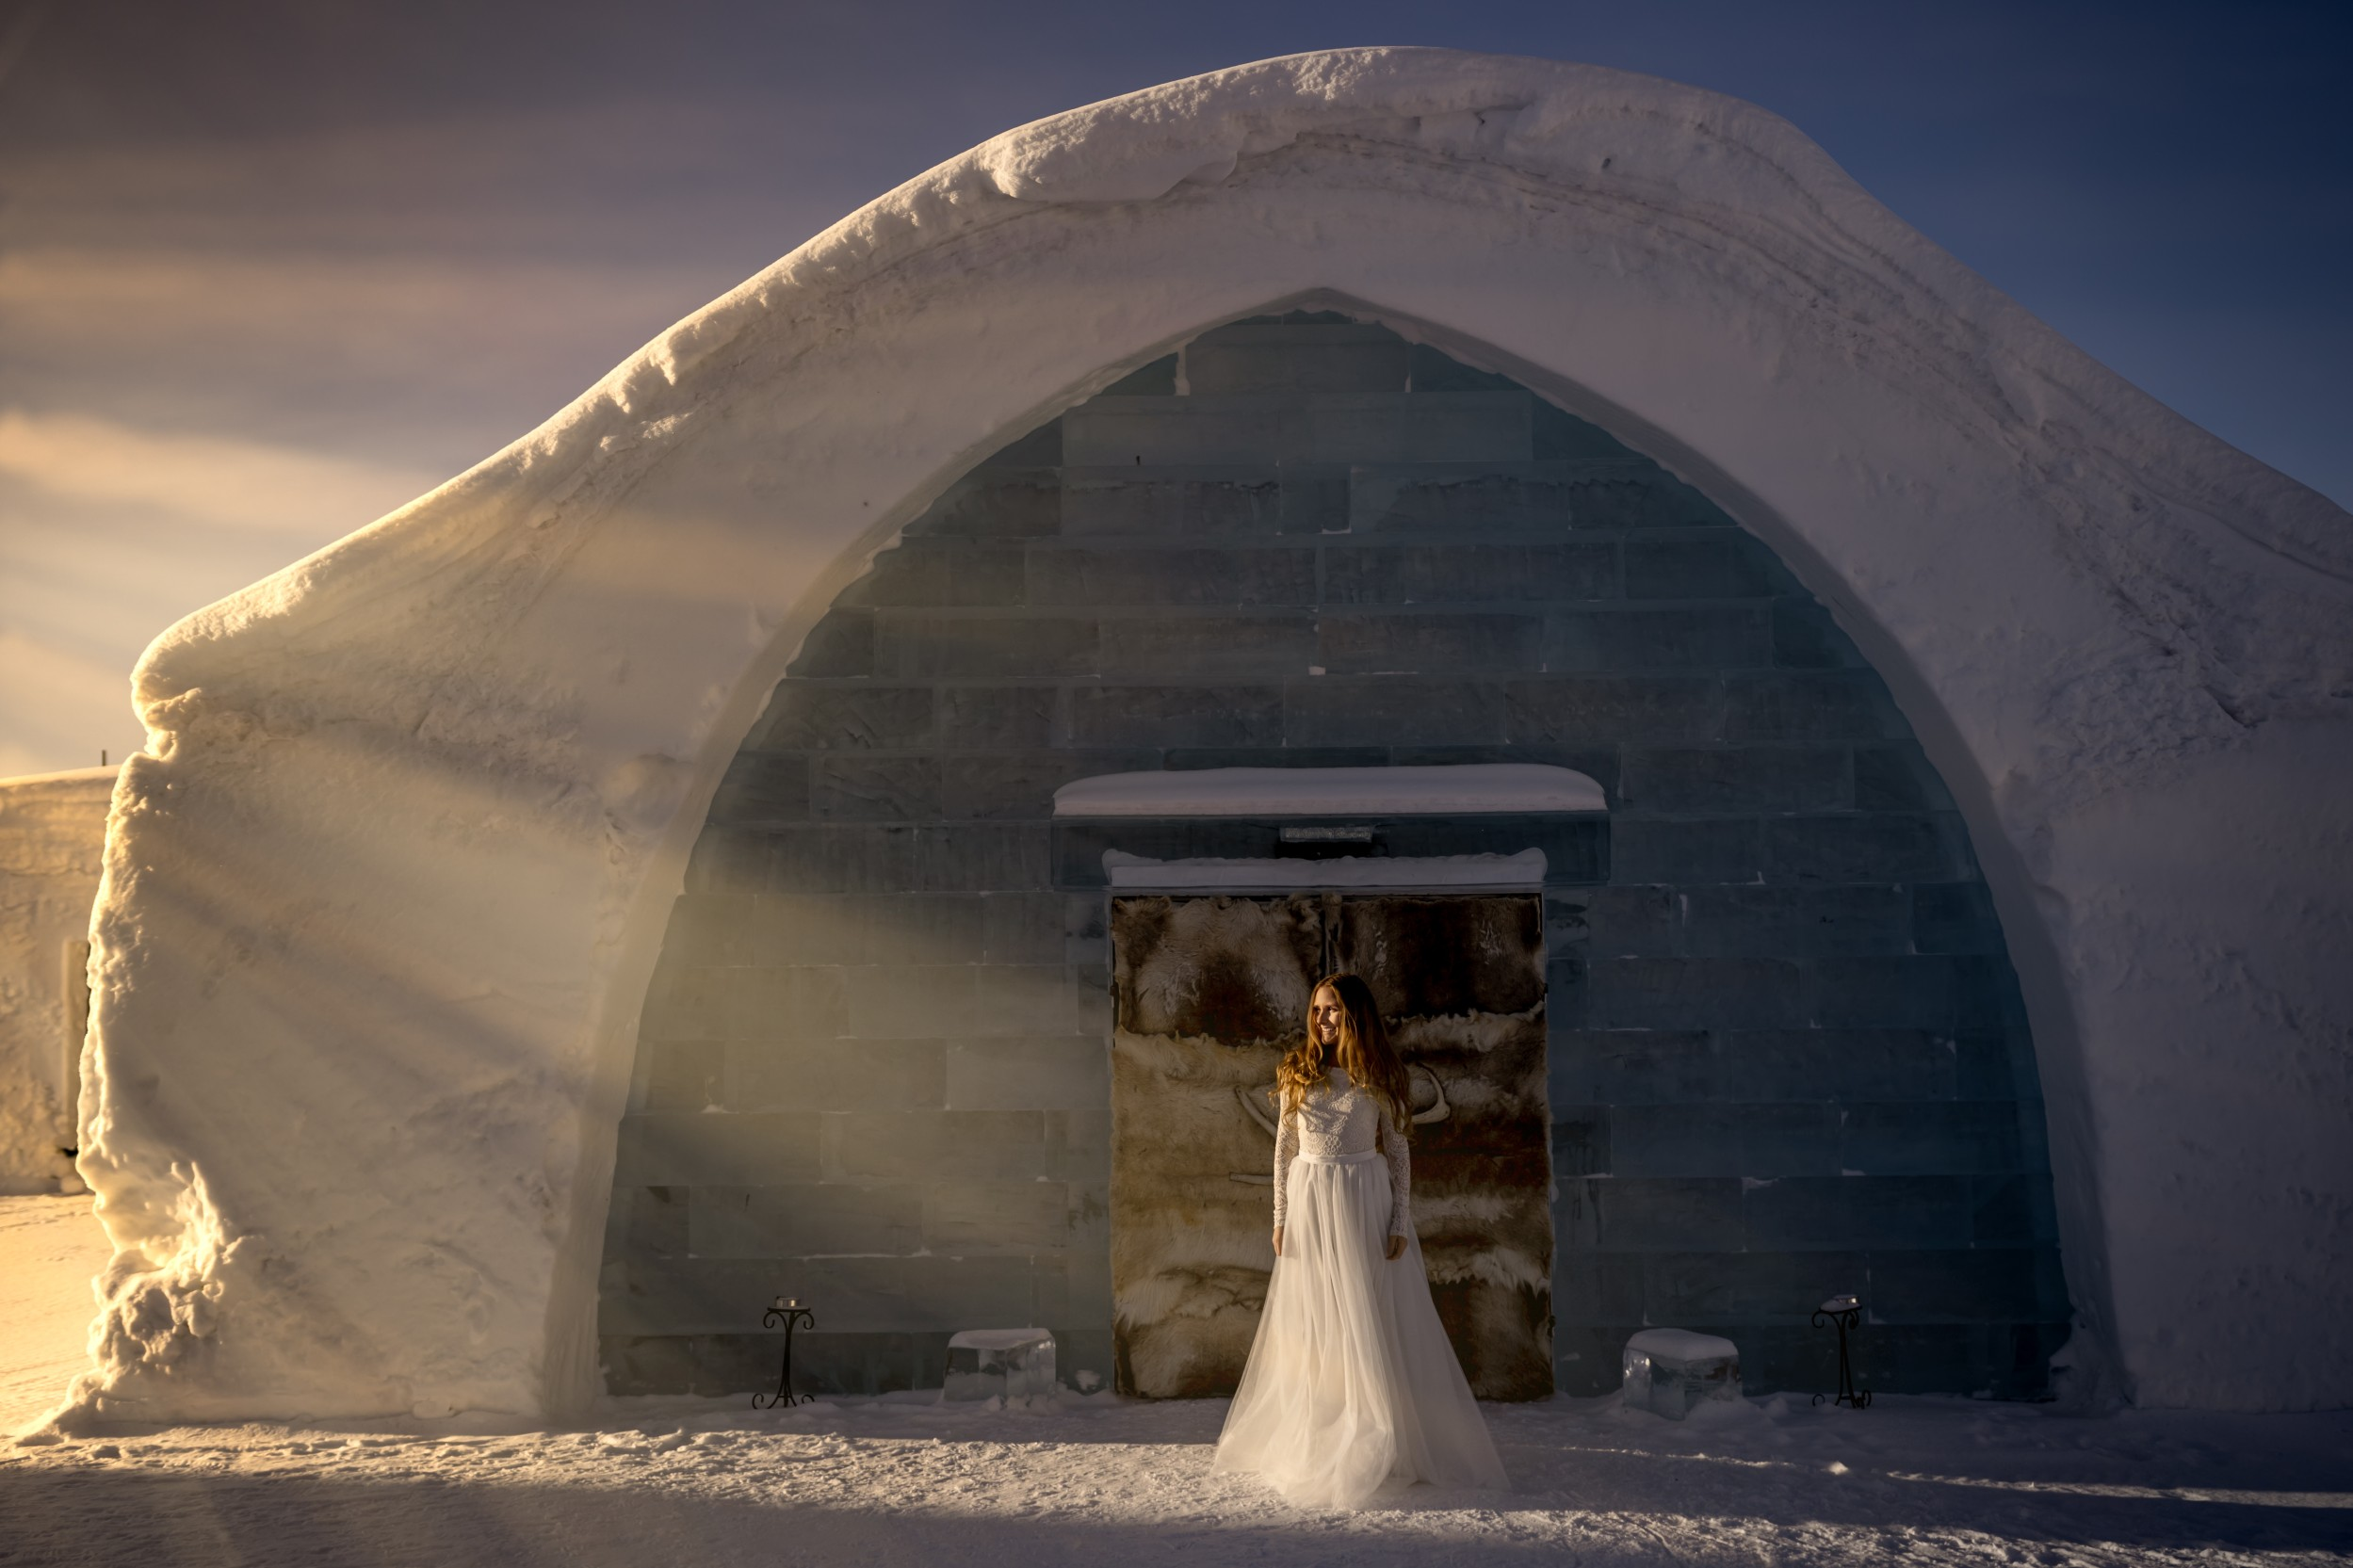 winter wedding at icehotel sweden - cinematic wedding photography - ice wedding - elopement in sweden - creative wedding photographer - unconventional wedding - alternative wedding - unique wedding - artistic wedding - sweden wedding- winter bride